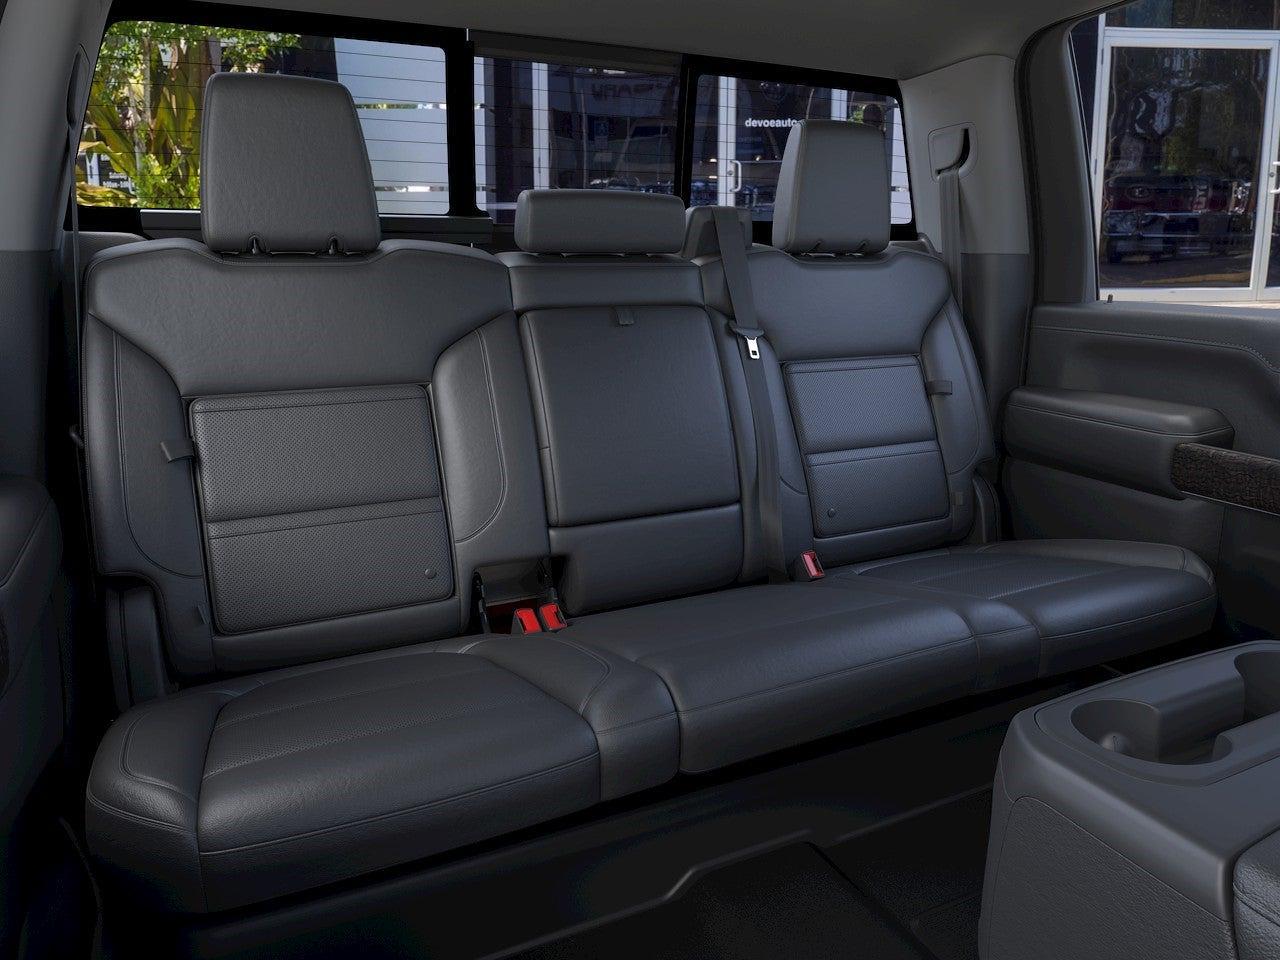 2021 GMC Sierra 2500 Crew Cab 4x4, Pickup #T21277 - photo 14